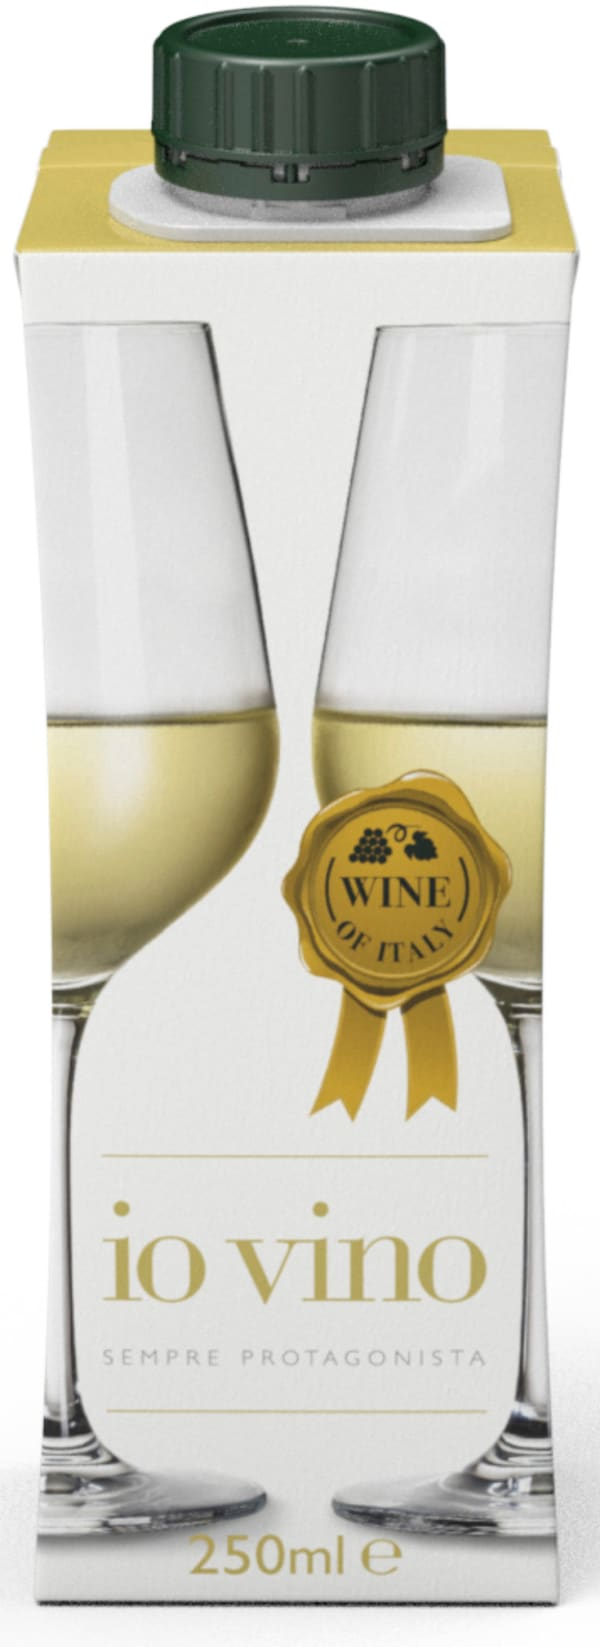 Io Vino Pinot Grigio kartongförpackning